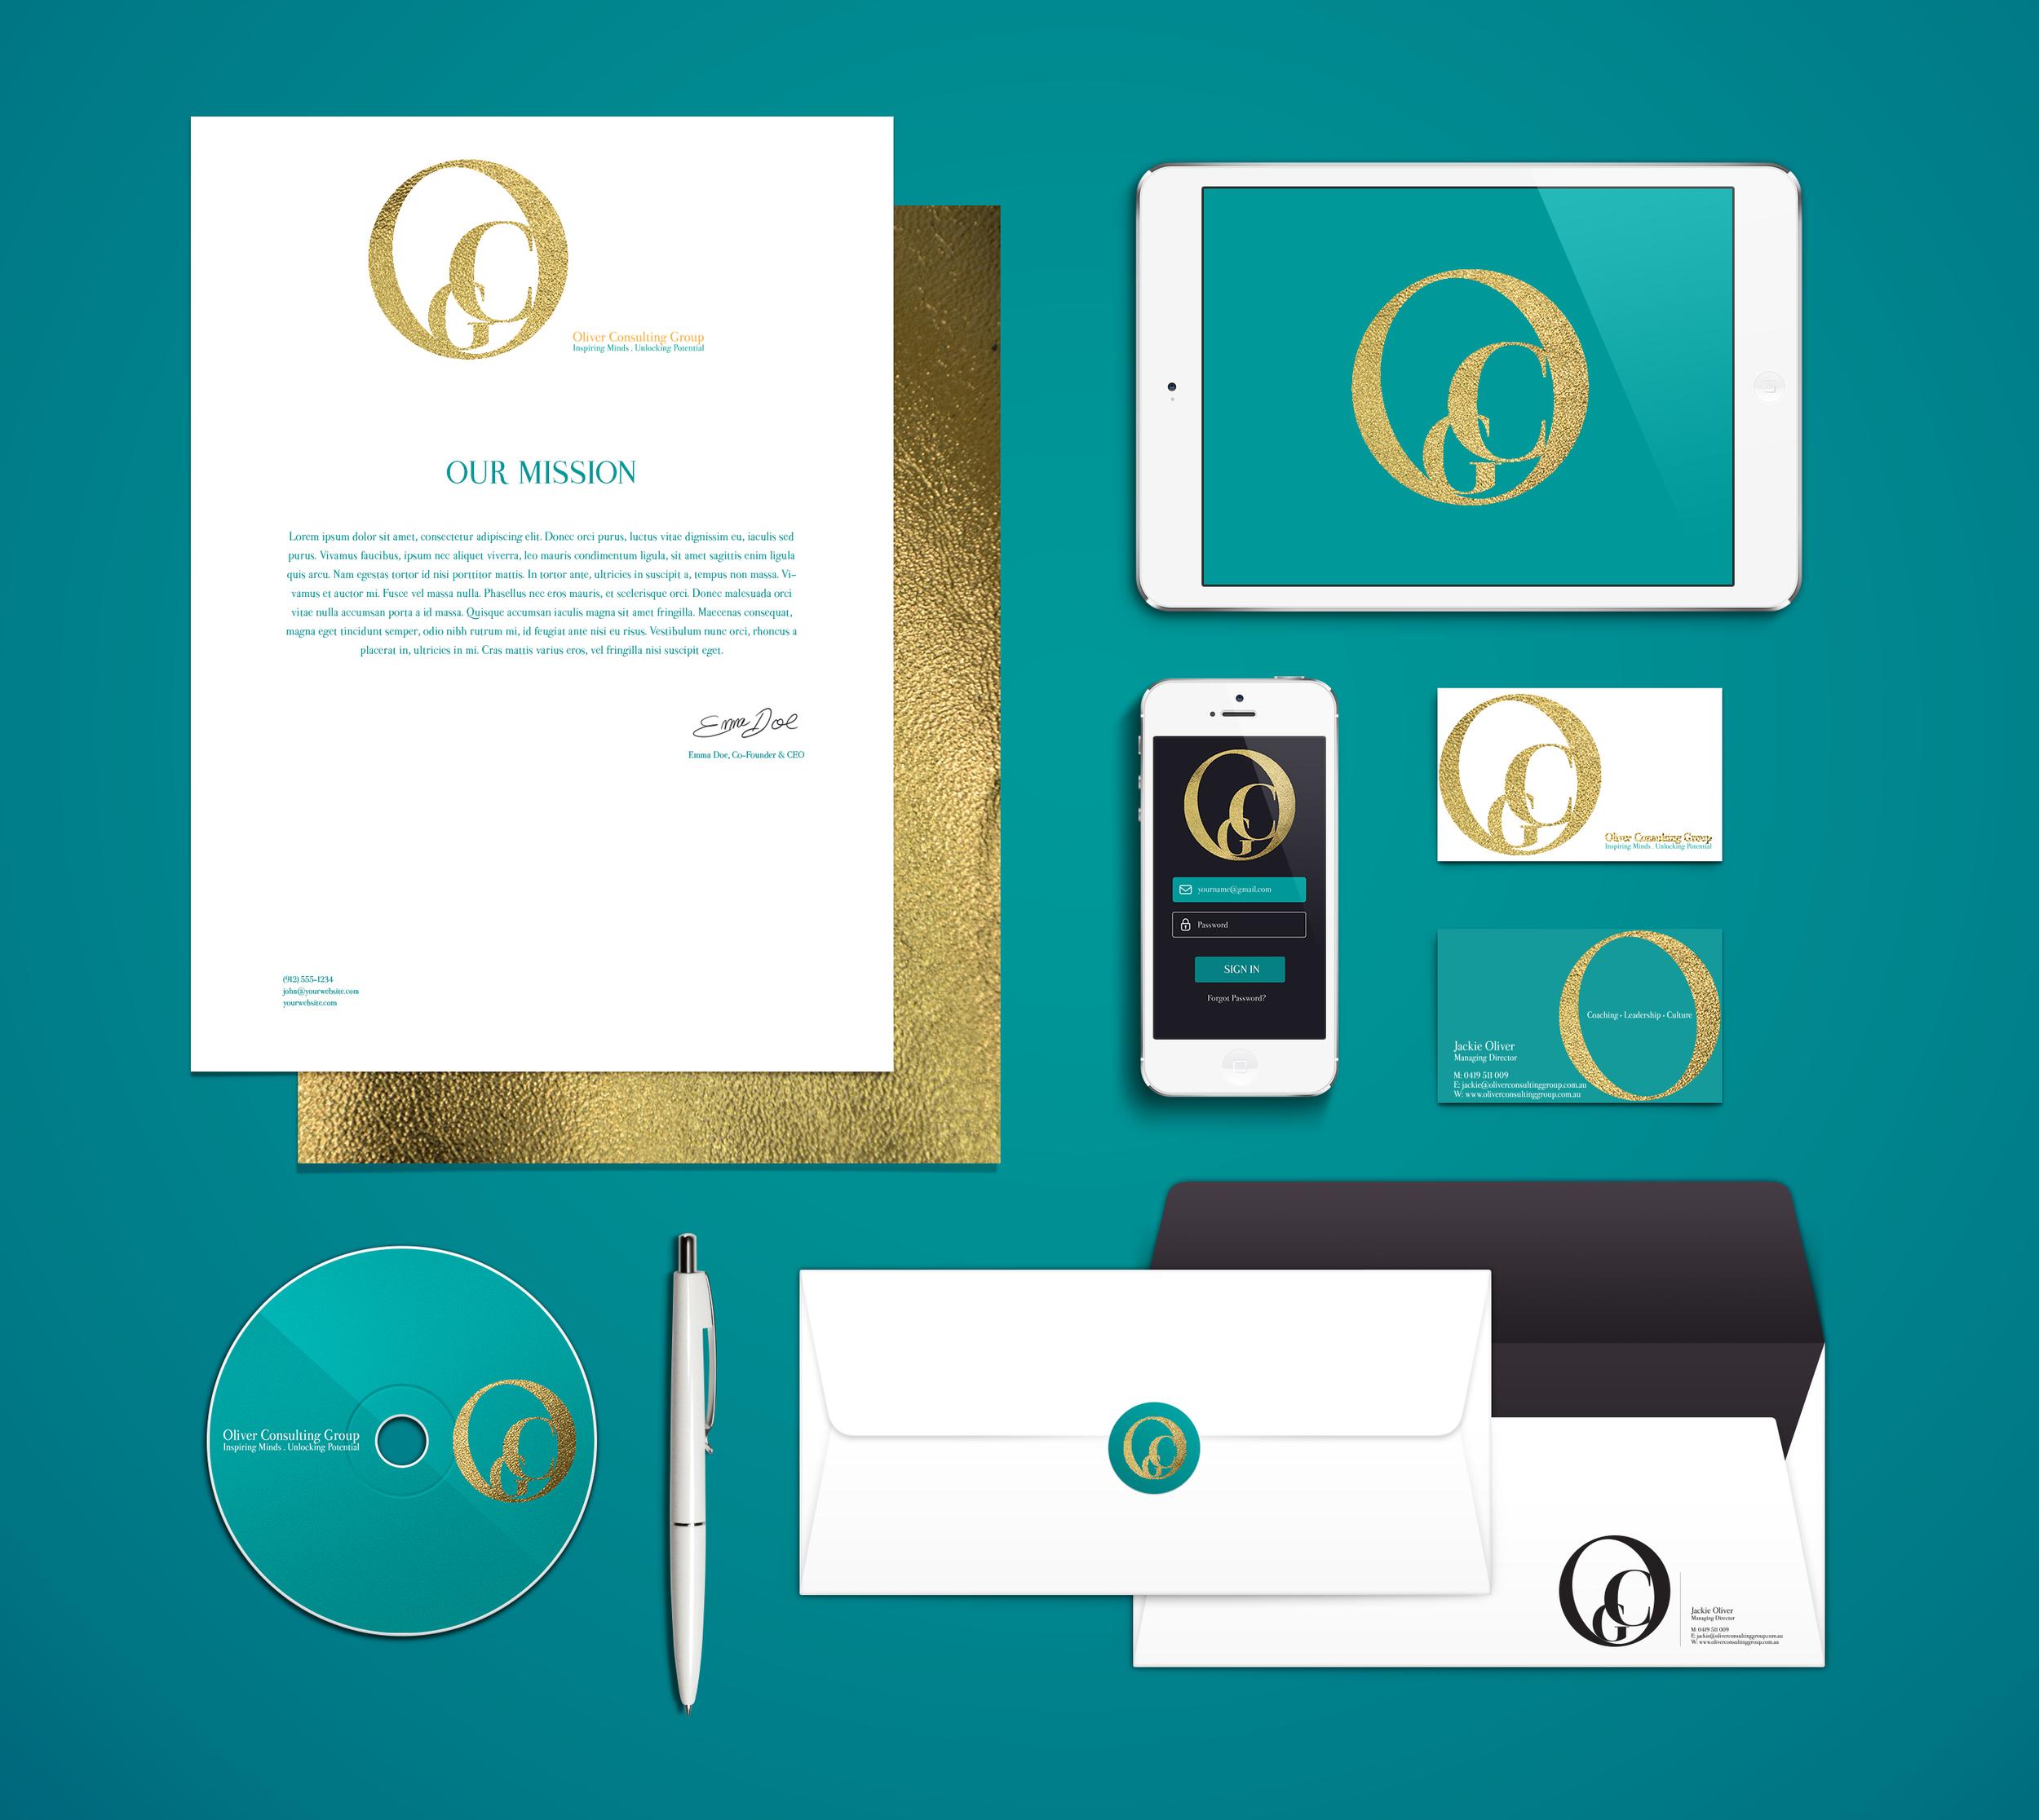 OCG_Branding+Identity+Mock-Up.jpg